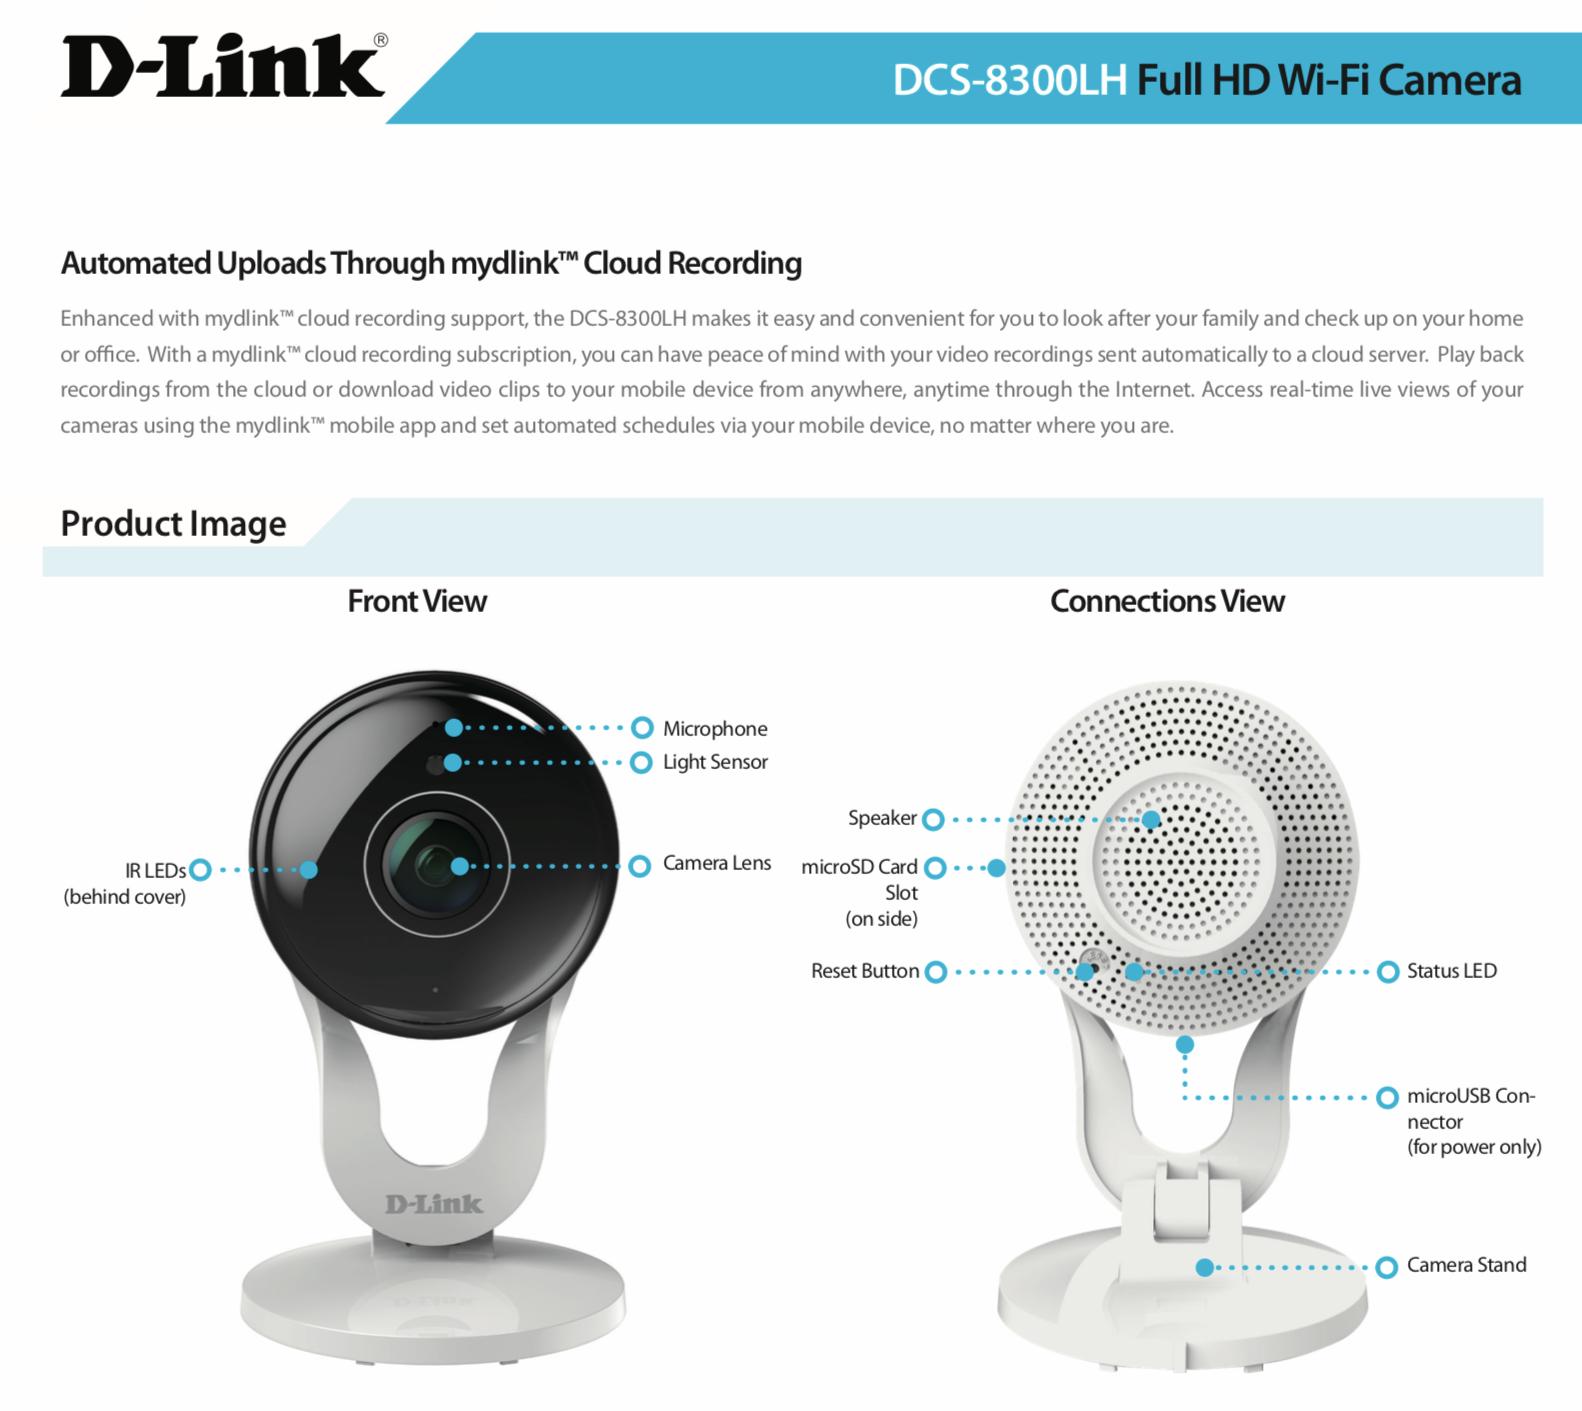 D-Link mydlink DCS-8300LH Network Camera - Monochrome, Color